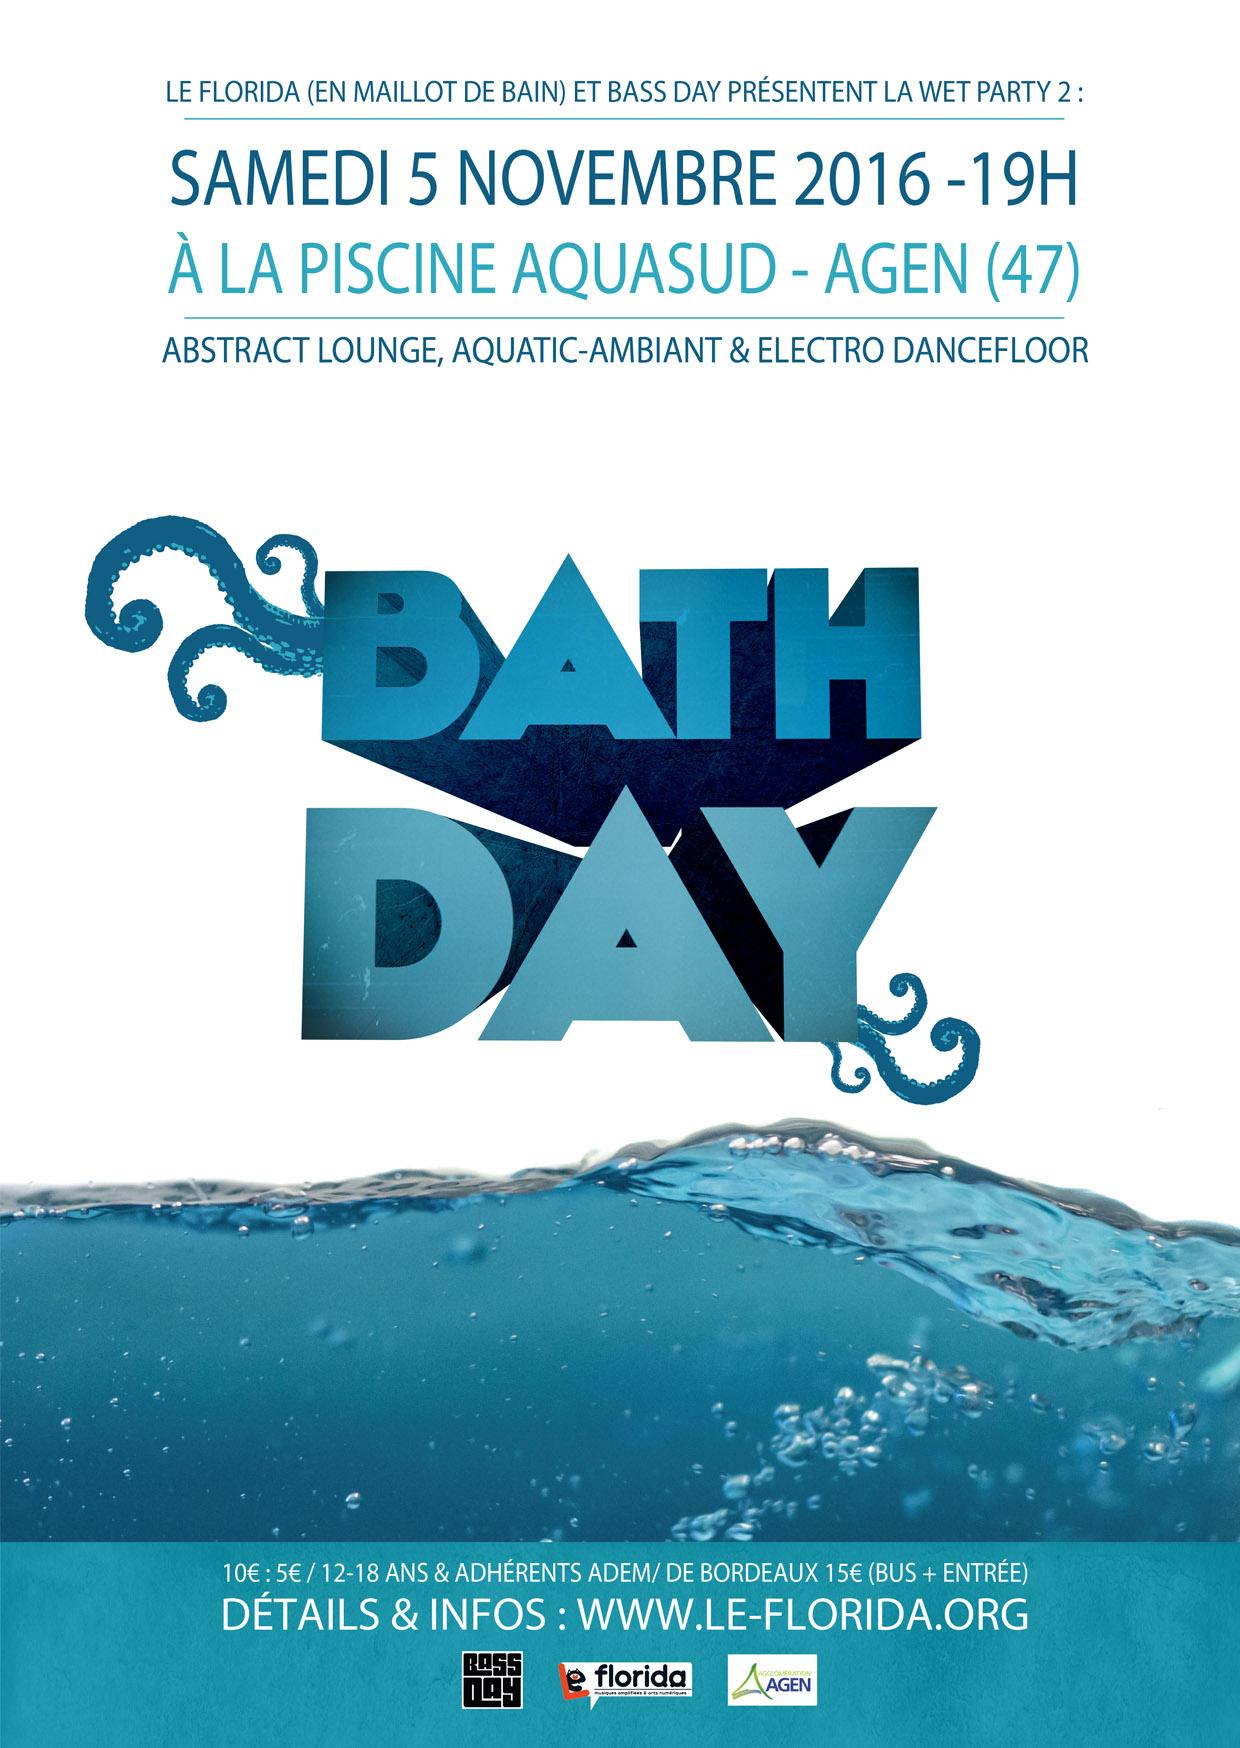 Bath Day | Le Florida - [Agen-47] concernant Musique Piscine